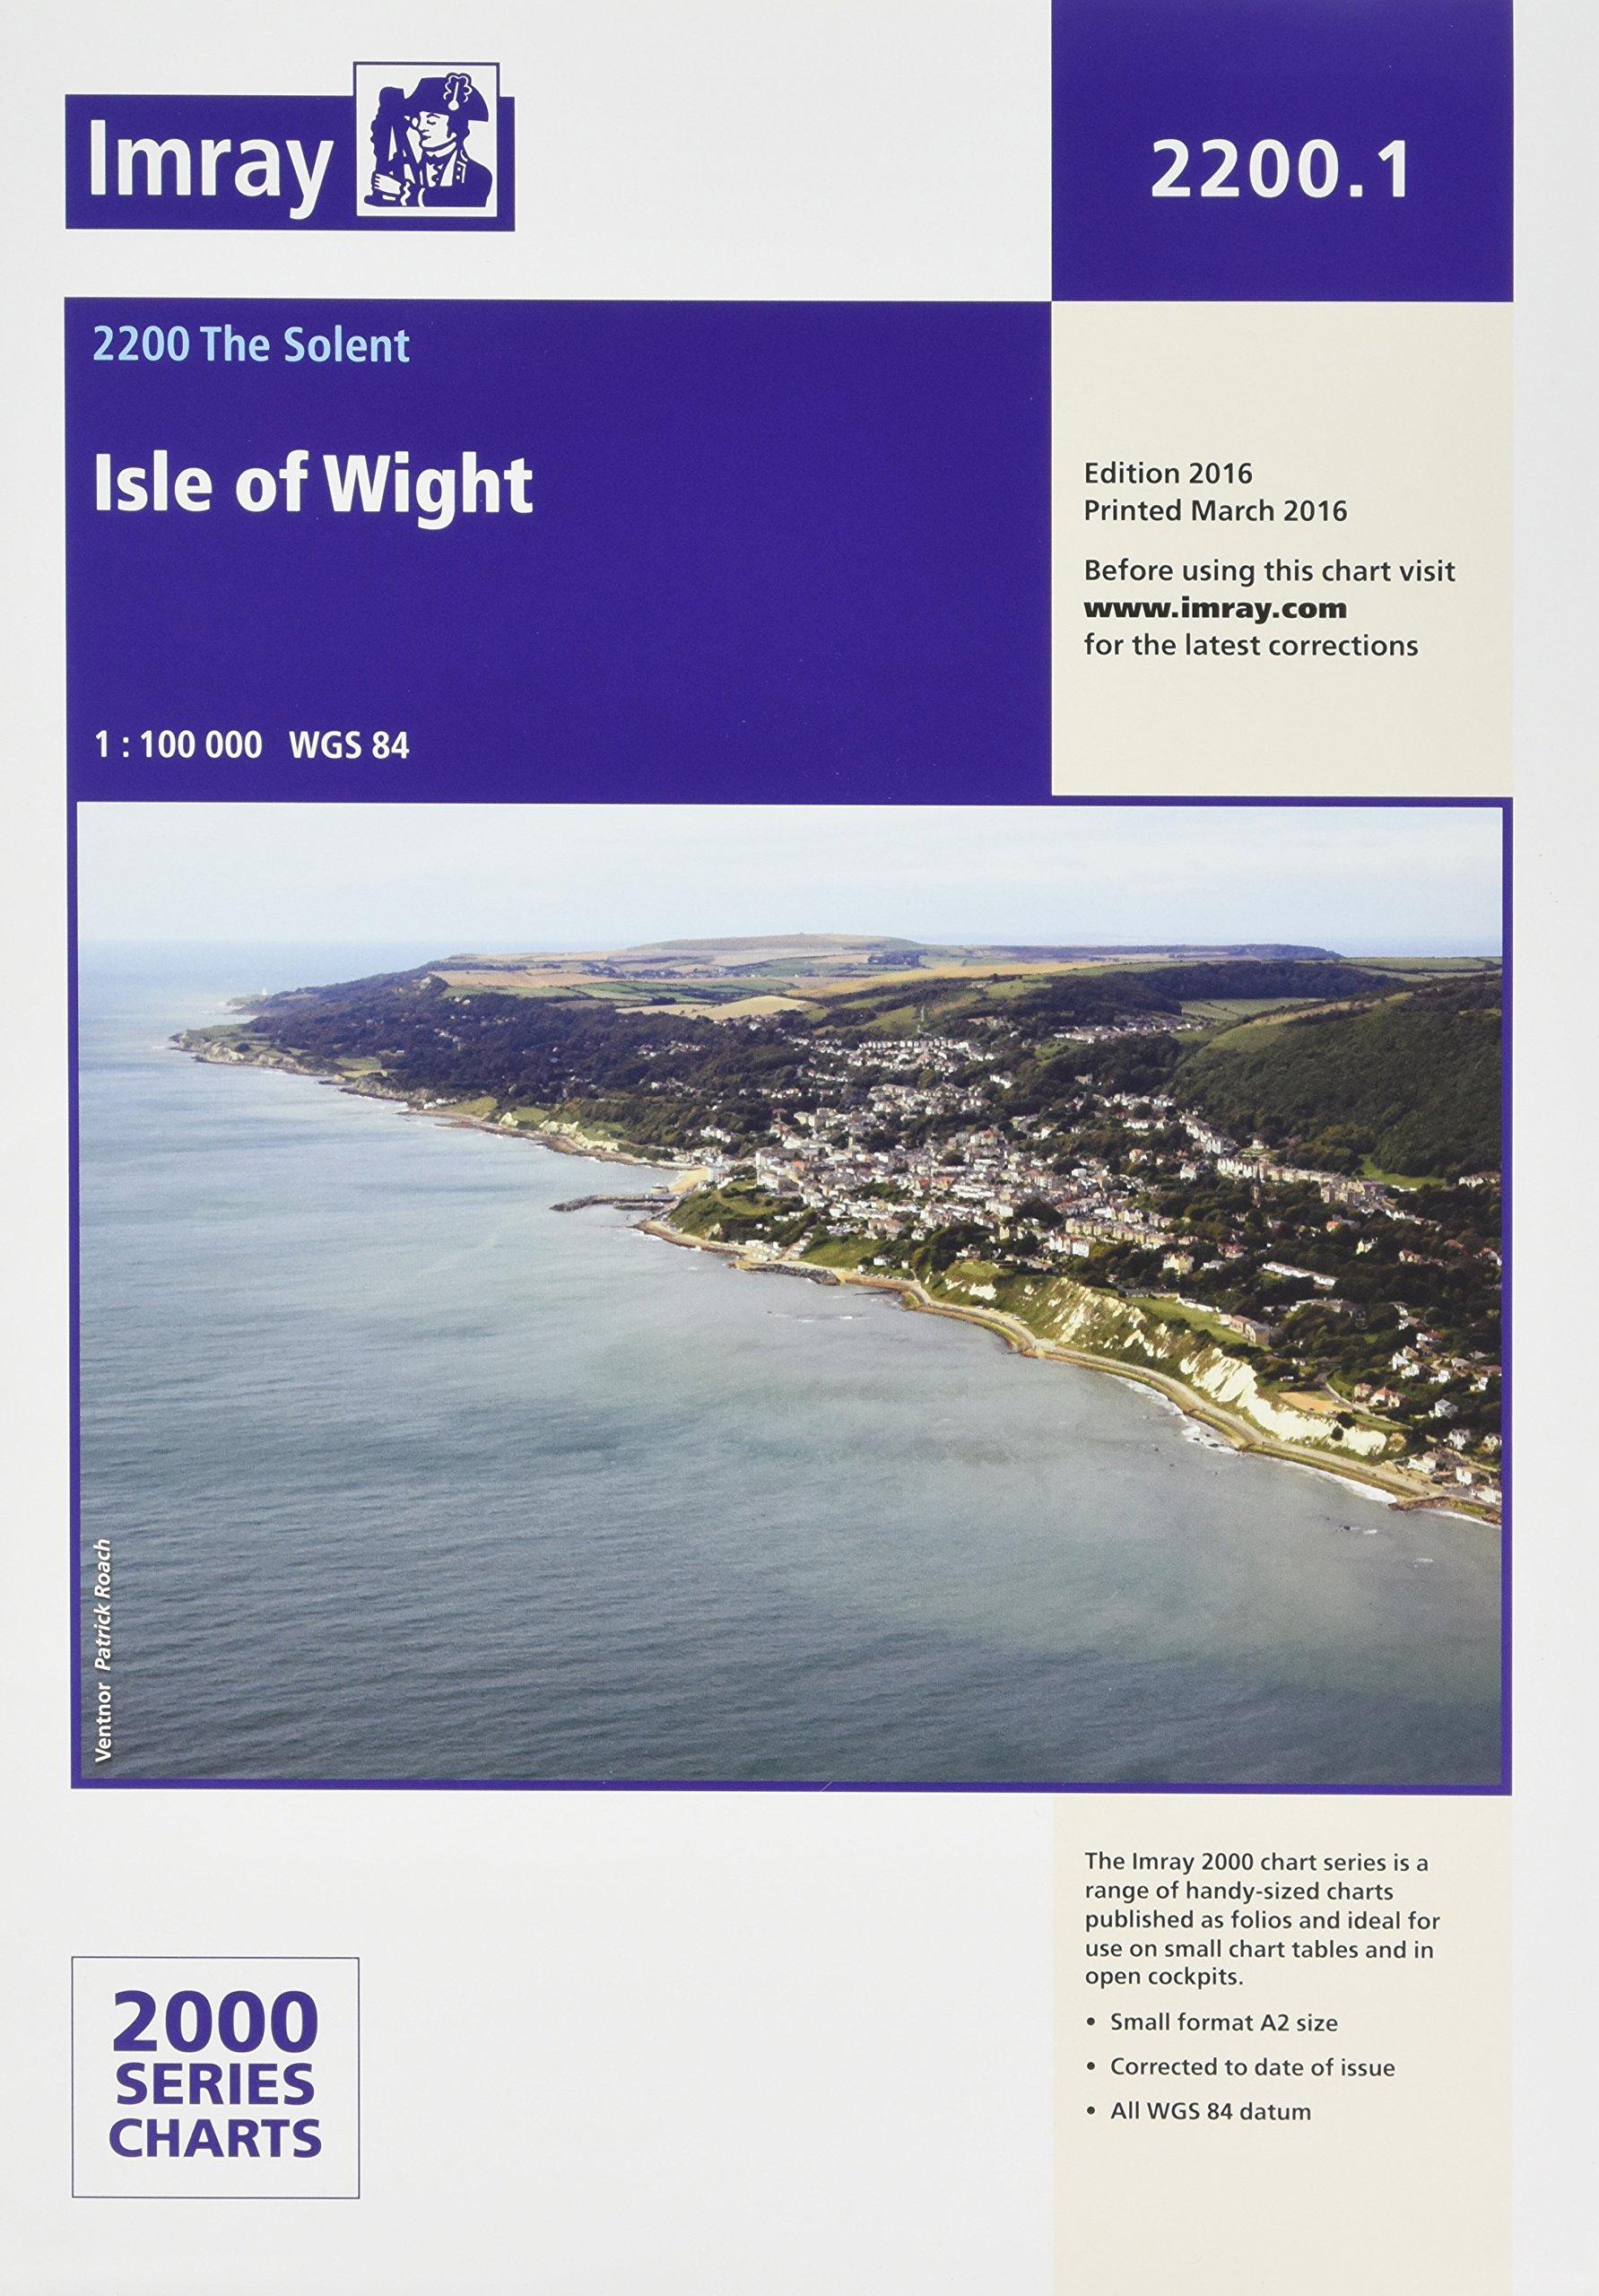 Download Imray Chart 2200.1 Isle of Wight (2000 Series) ebook